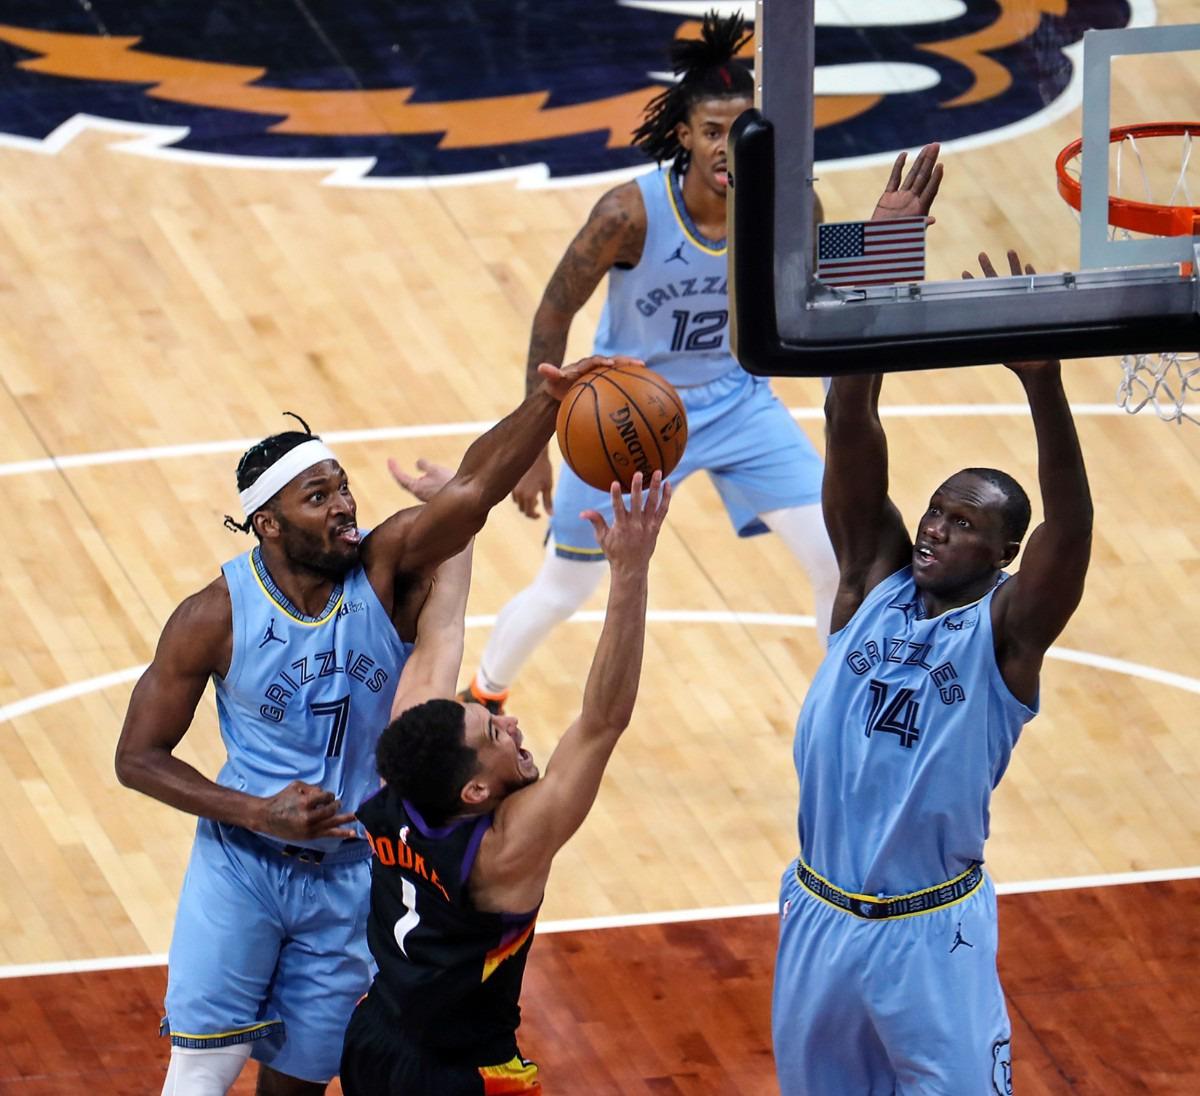 <strong>Memphis Grizzlies forward Justise Winslow (7) blocks Phoenix Suns guard Devin Booker (1) during a Feb. 20, 2021 game at the FedExForum.</strong> (Patrick Lantrip/Daily Memphian)